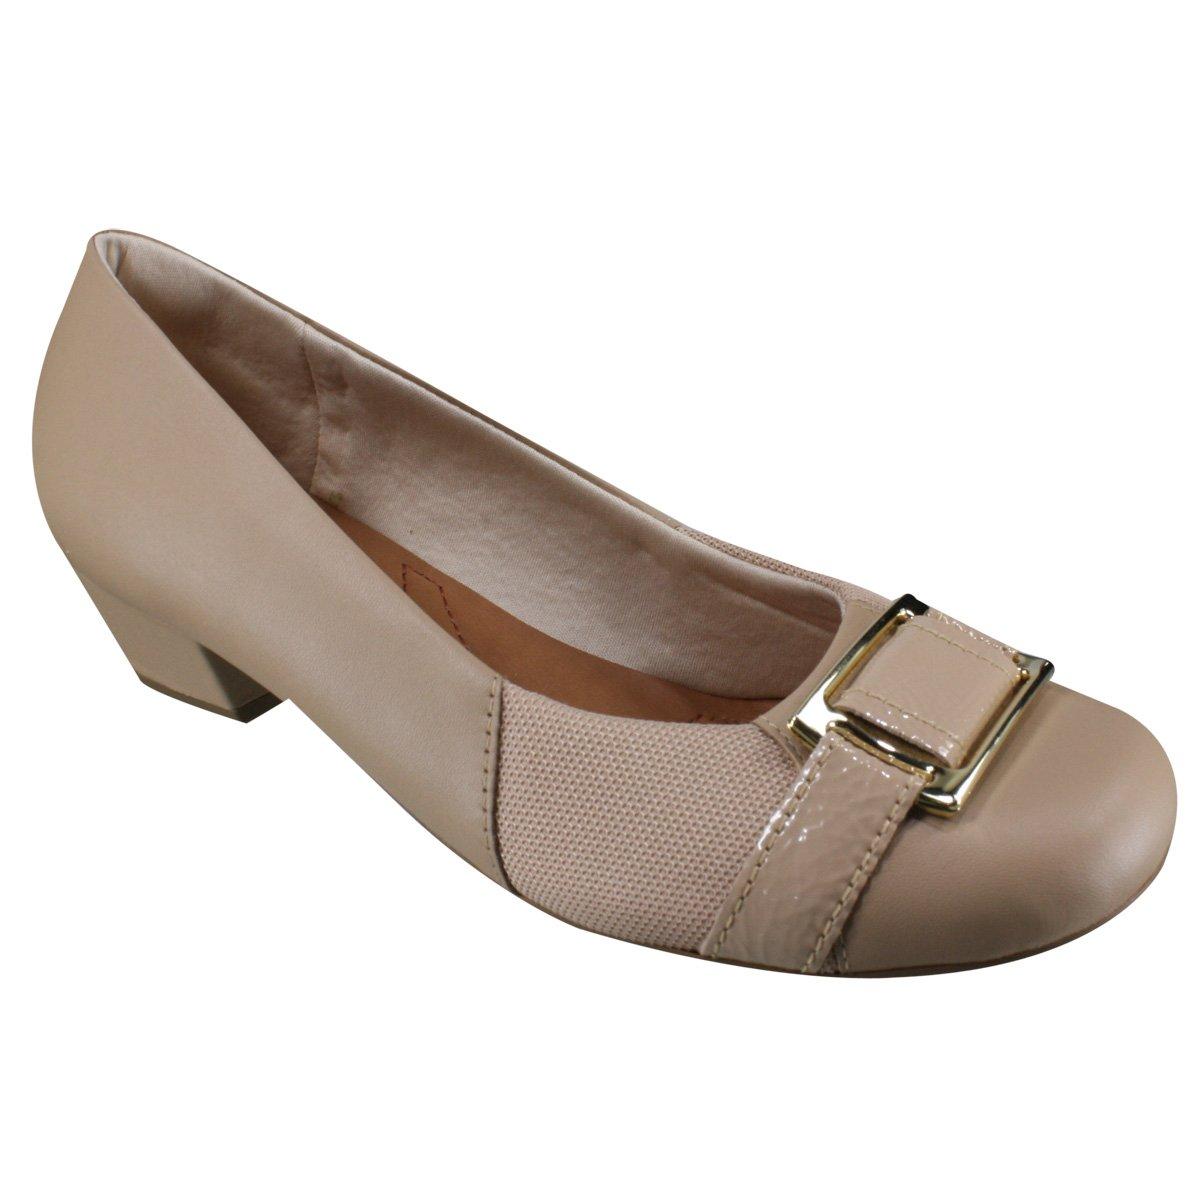 3560fb694 Sapato Feminino Usaflex Care Joanetes AA1202 3 - Blush (Soft Slim ...